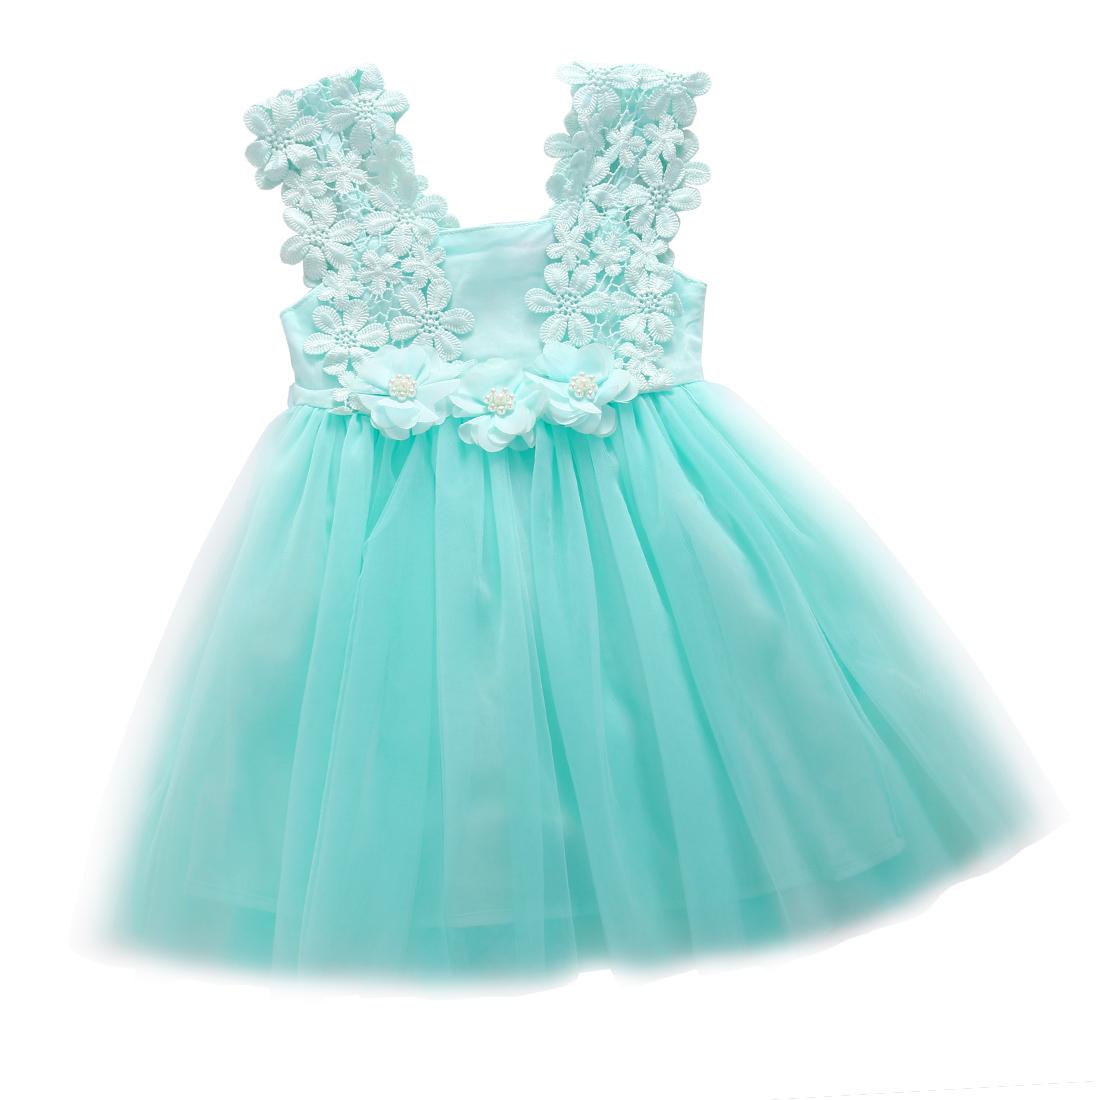 Cute Baby Girl font b Dress b font Princess Party Sleeveless font b Dress b font